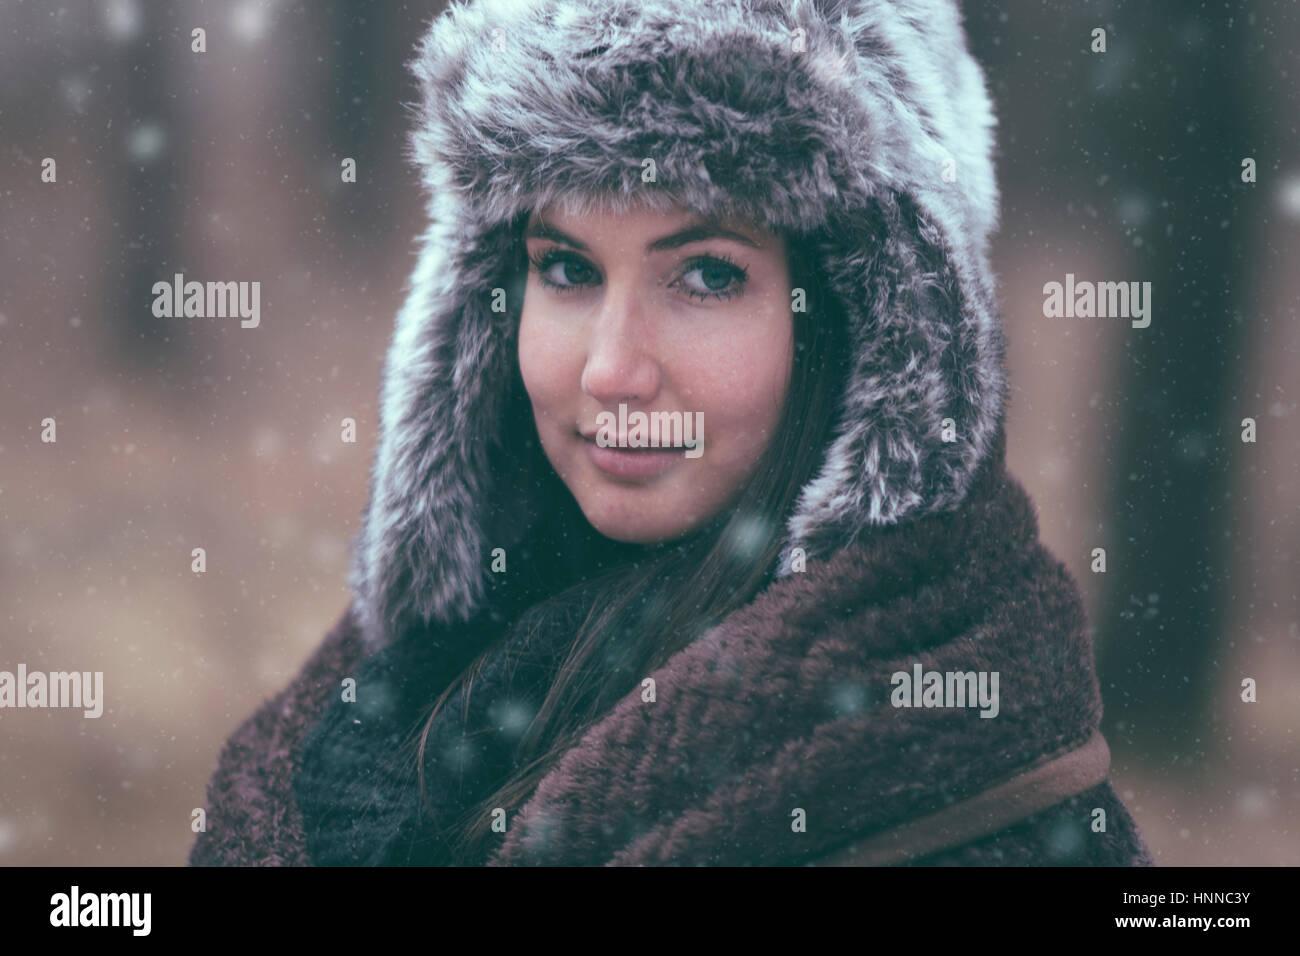 Woman in snowfall - Stock Image